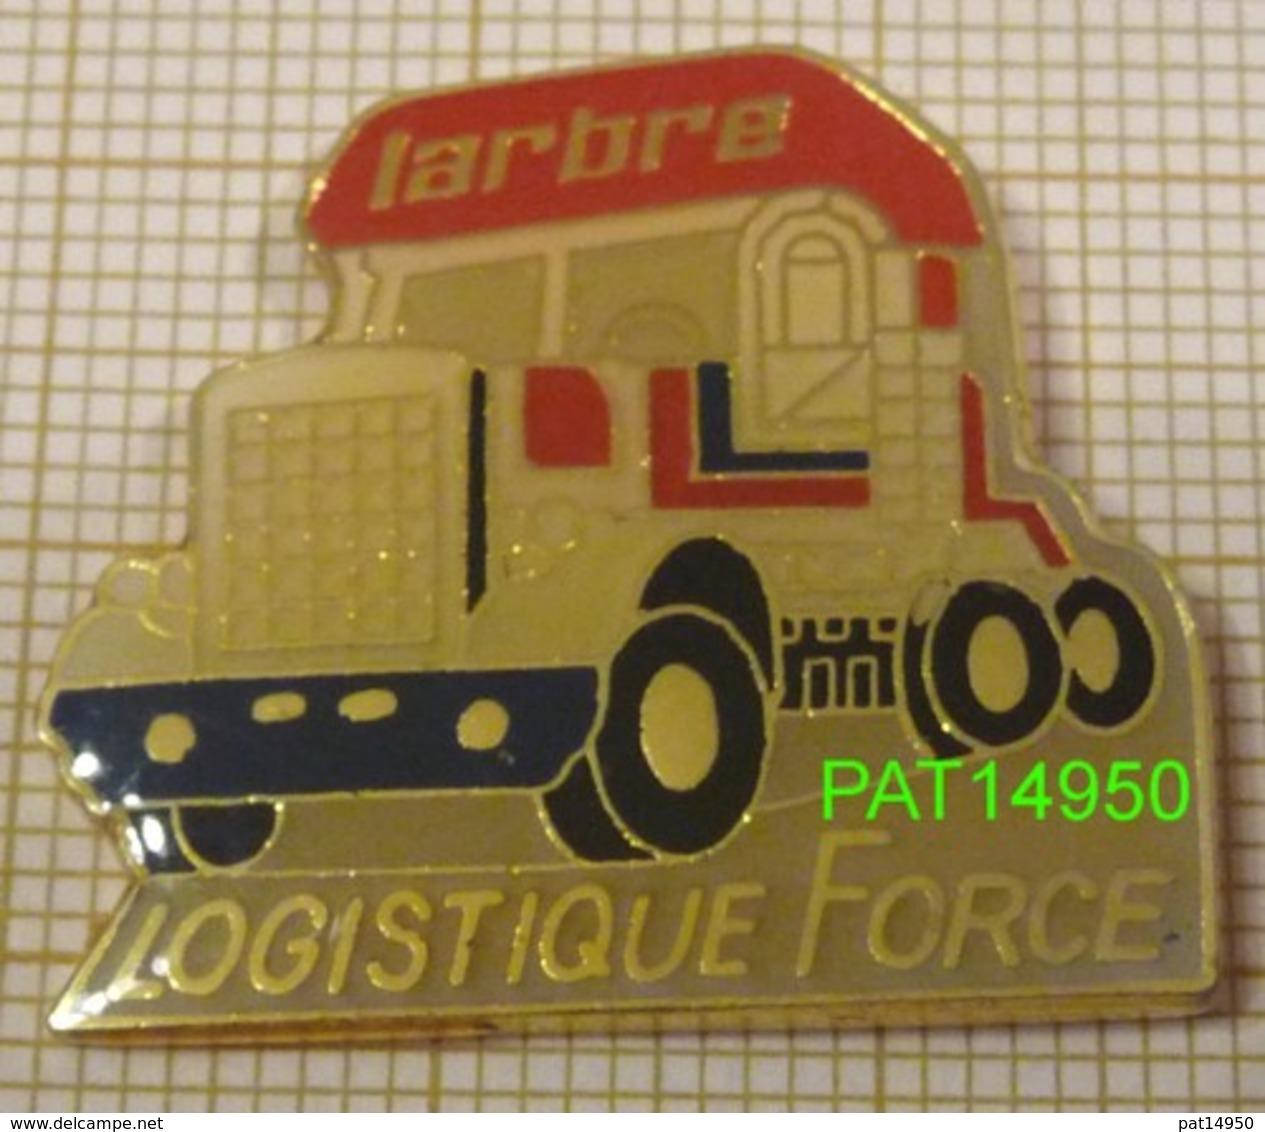 TRANSPORTS LARBRE  LOGISTIQUE FORCE  CAMION AMERICAIN - Transport